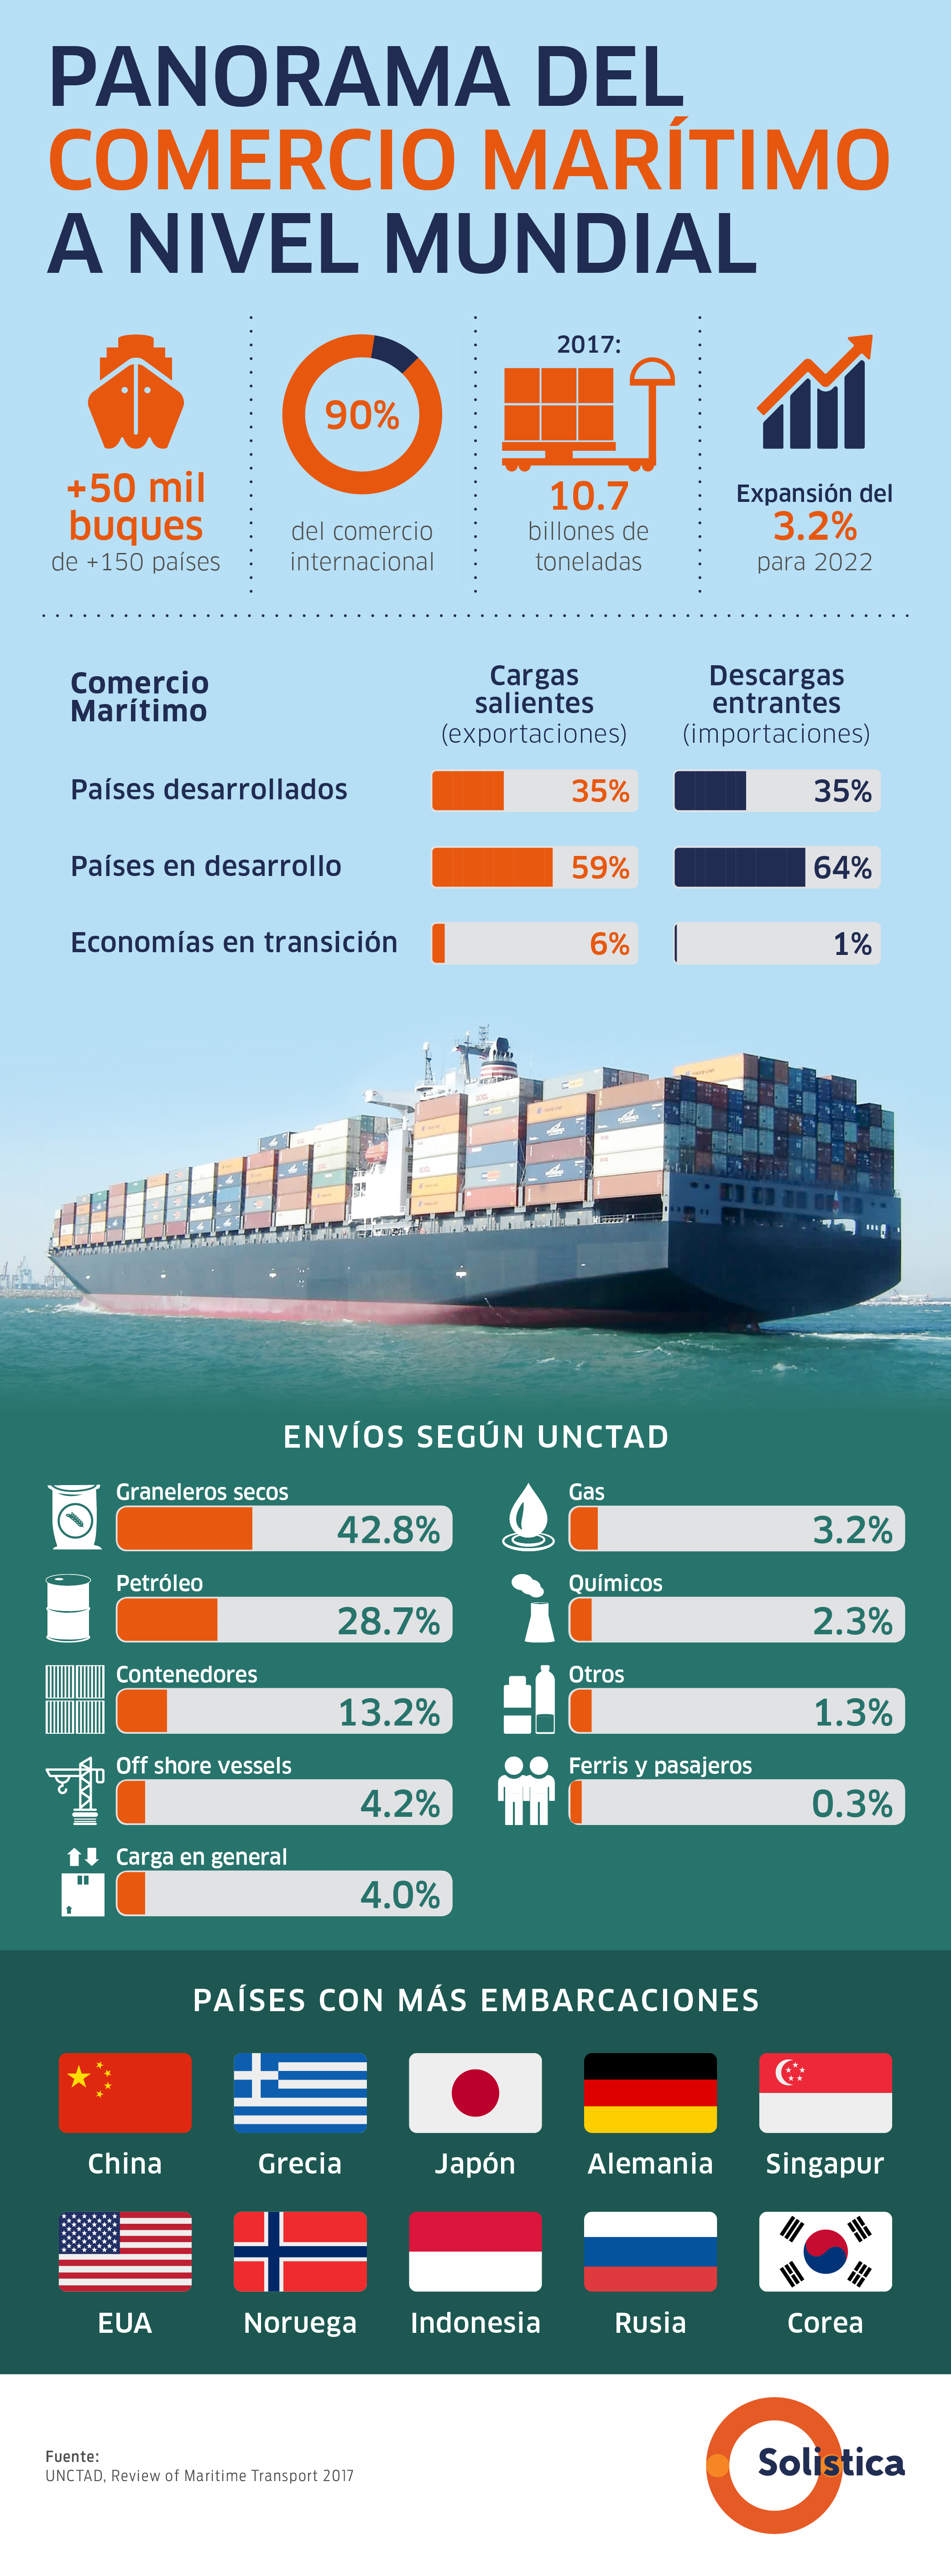 SOL- Blog no. 6 DIC Panorama global del comercio marítimo V3